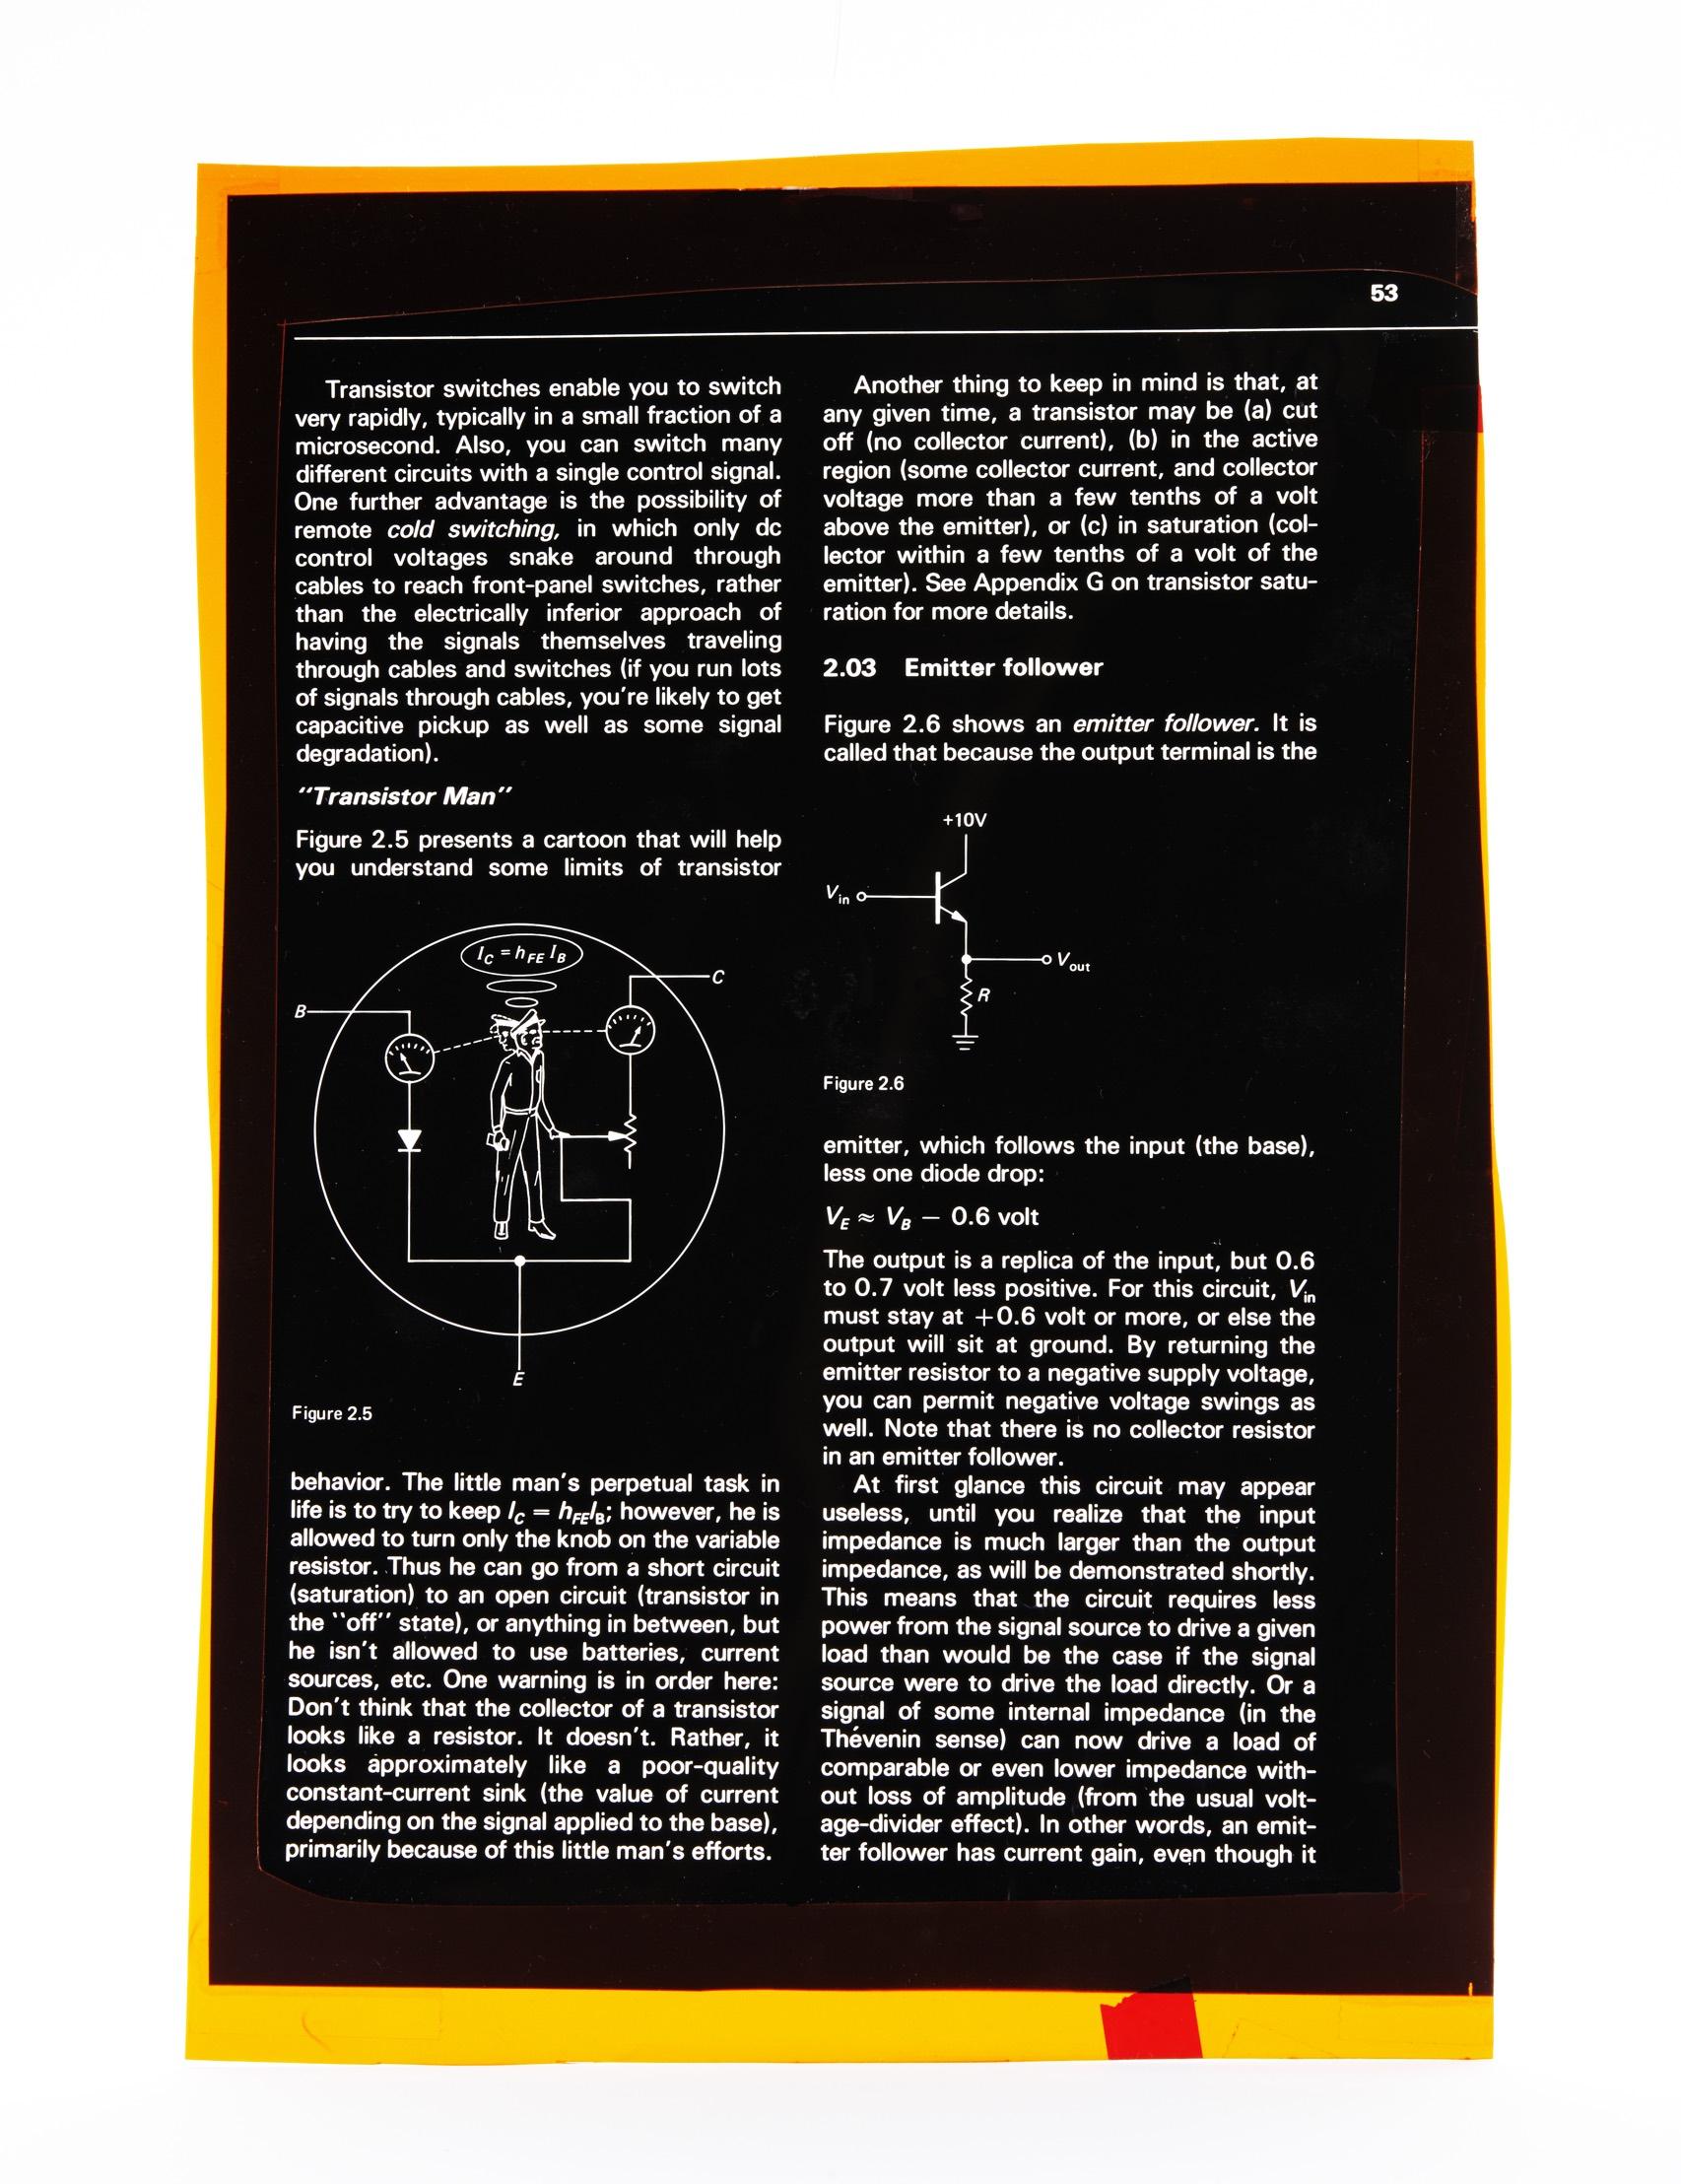 Horowitz Transistor Man Page Front Orig 009